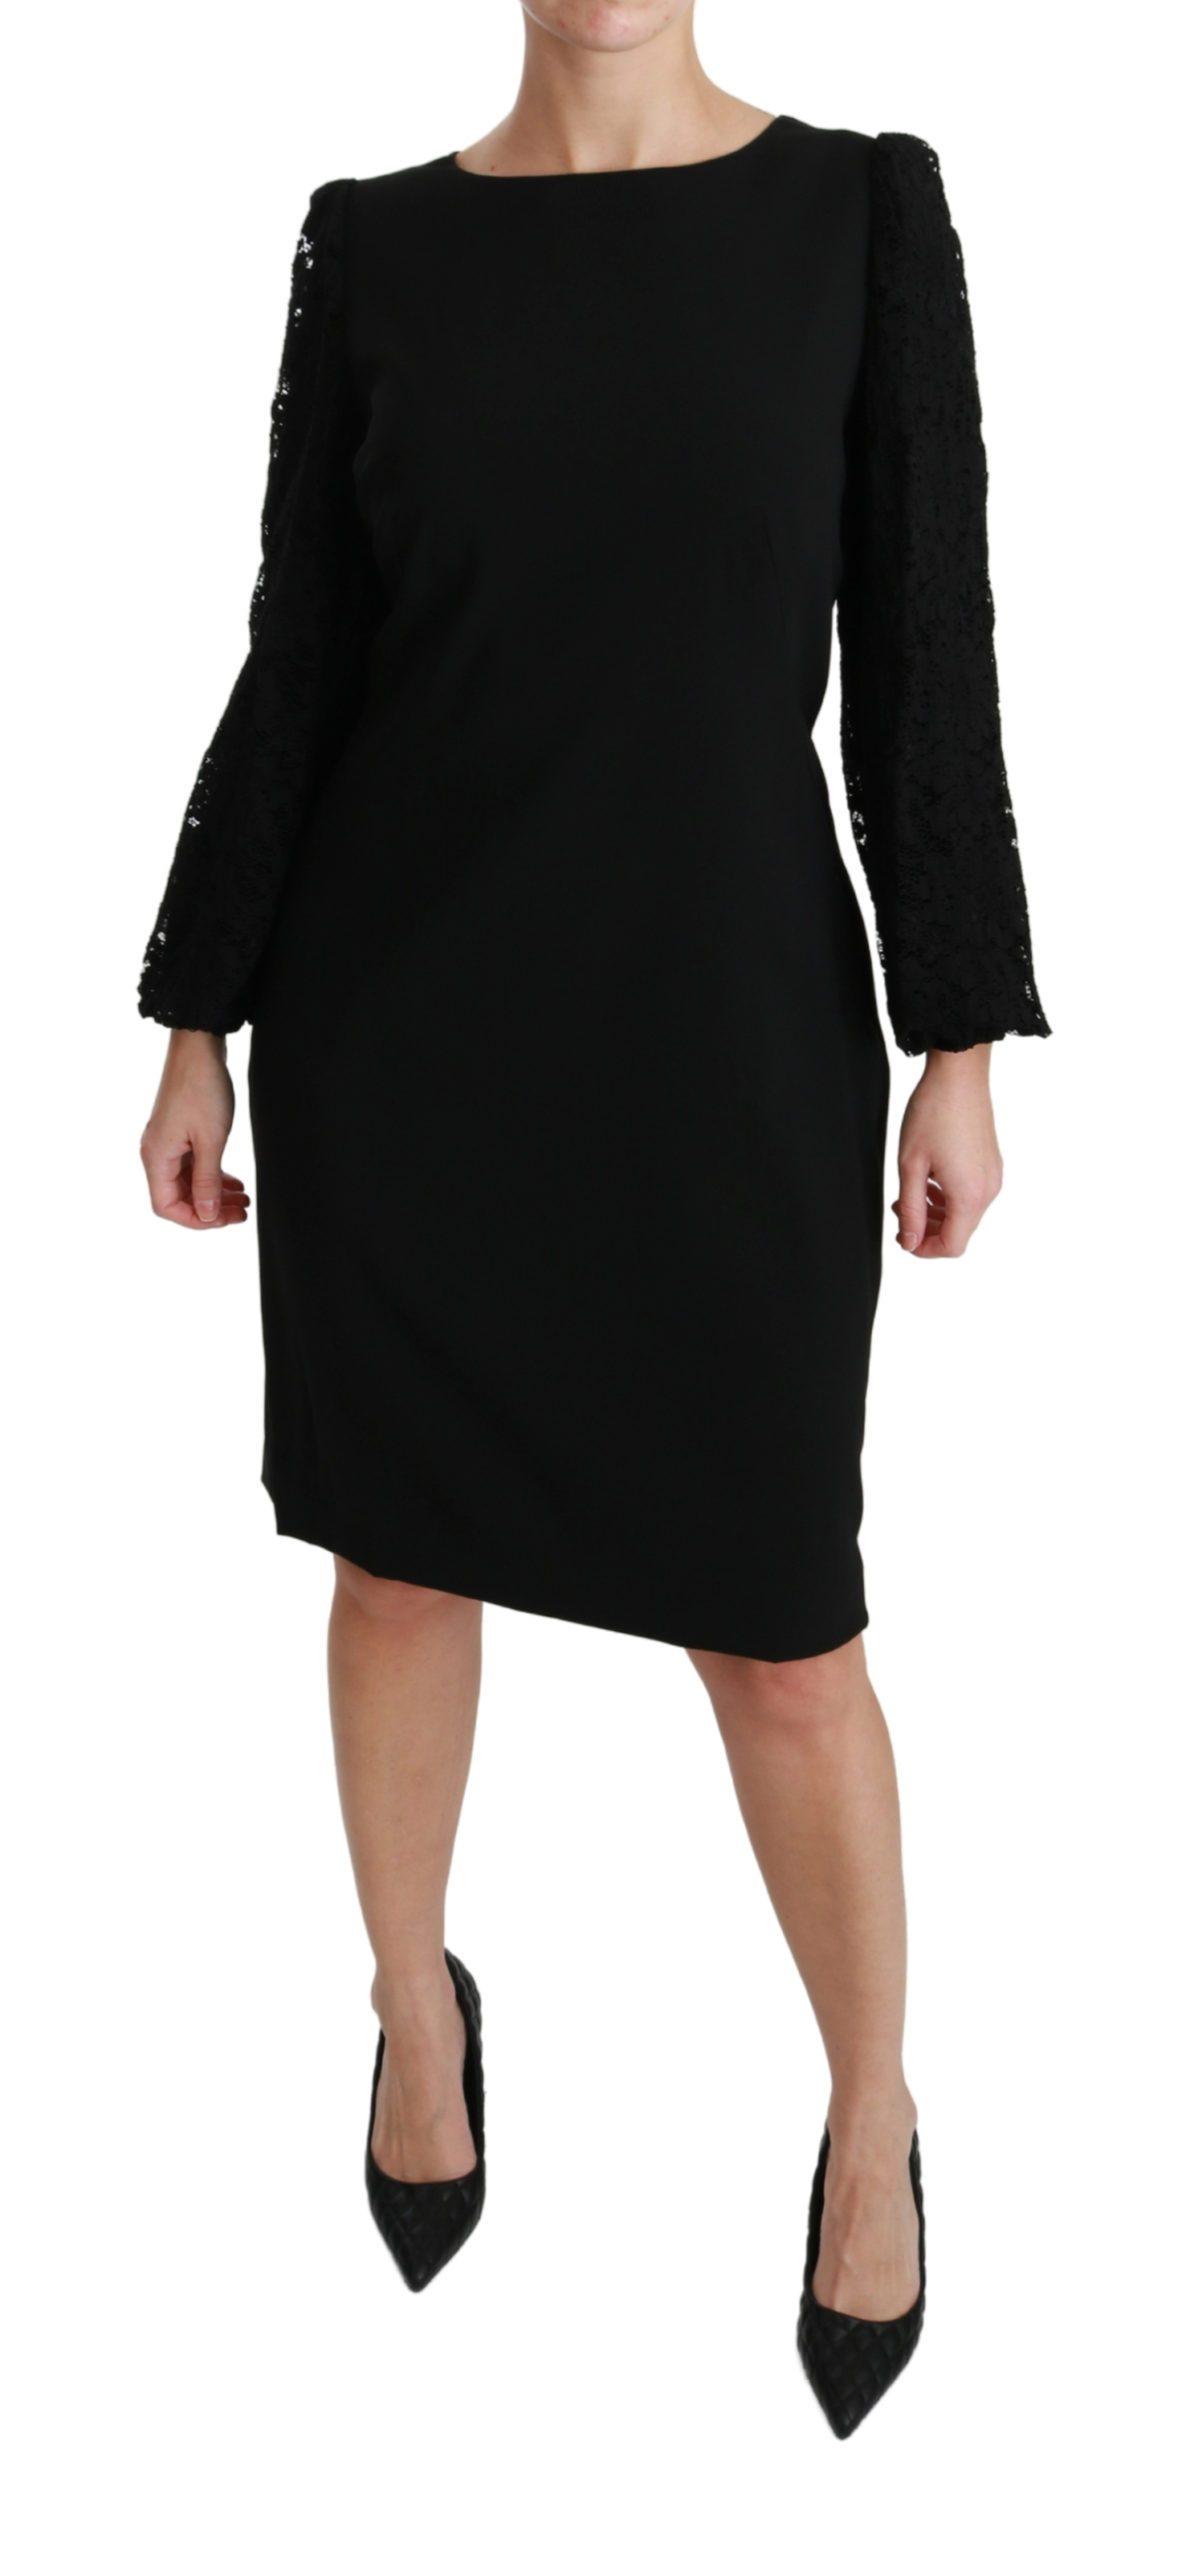 Dolce & Gabbana Women's Floral Lace Sheath Gown Dress Black DR2164 - IT36|XXS